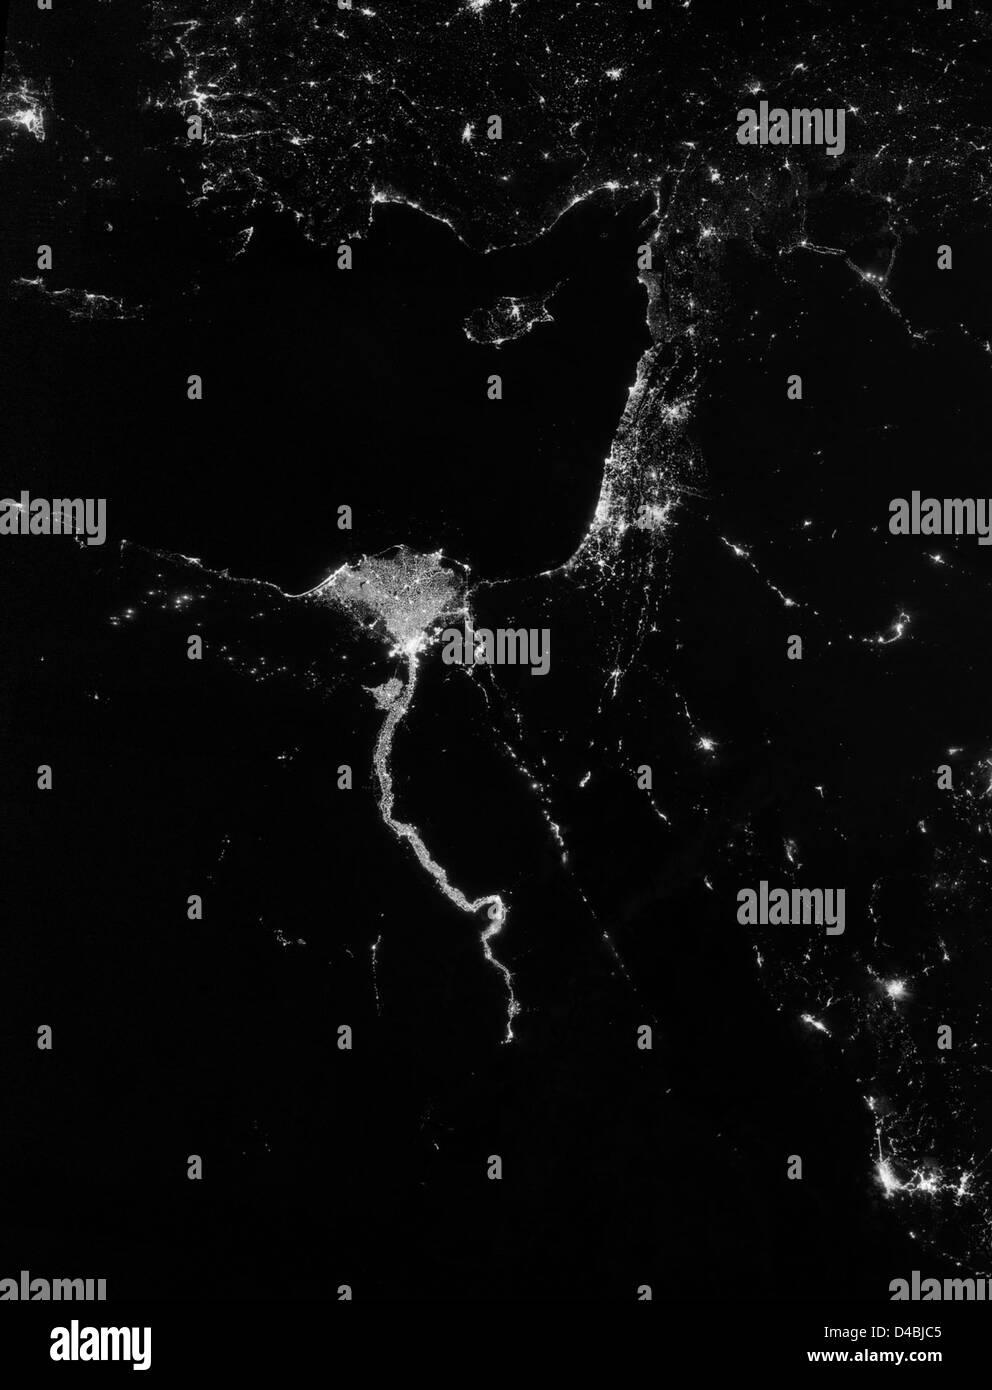 City Lights Illuminate the Nile - Stock Image